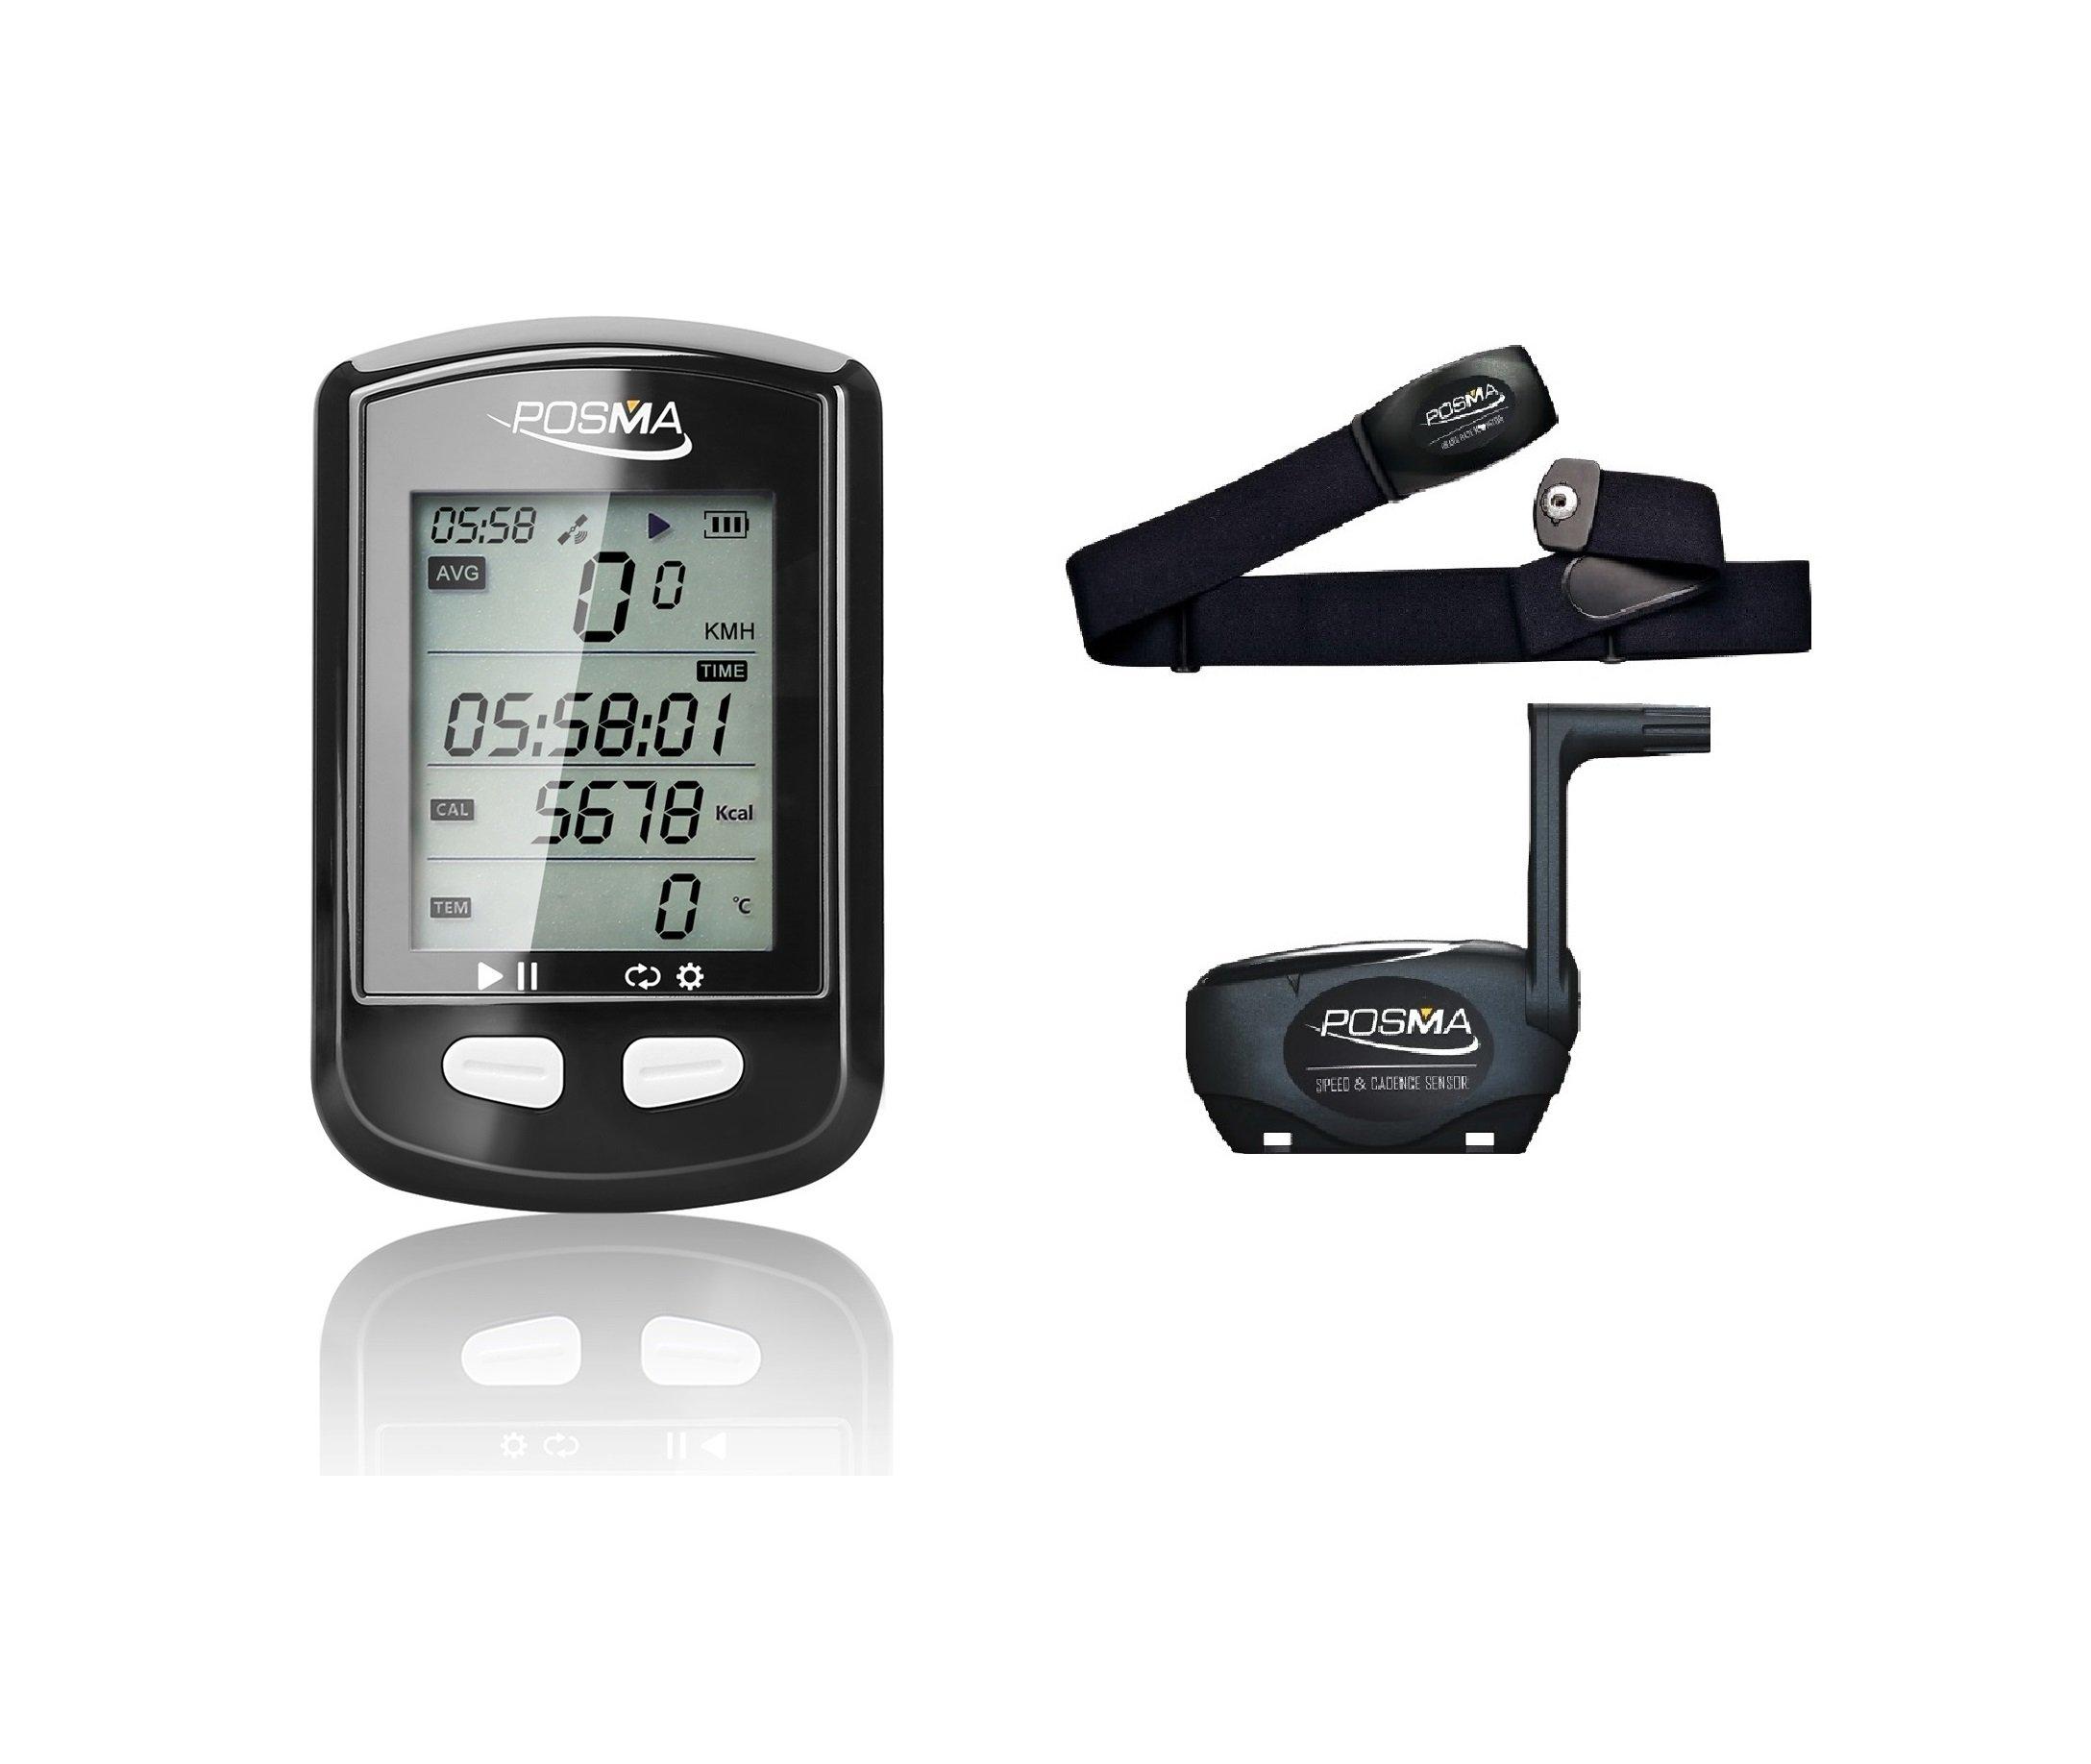 POSMA DB2 Bluetooth GPS Cycling Bike Computer Bundle with BHR20 Heart Rate Monitor and BCB20 Speed/Cadence Sensor